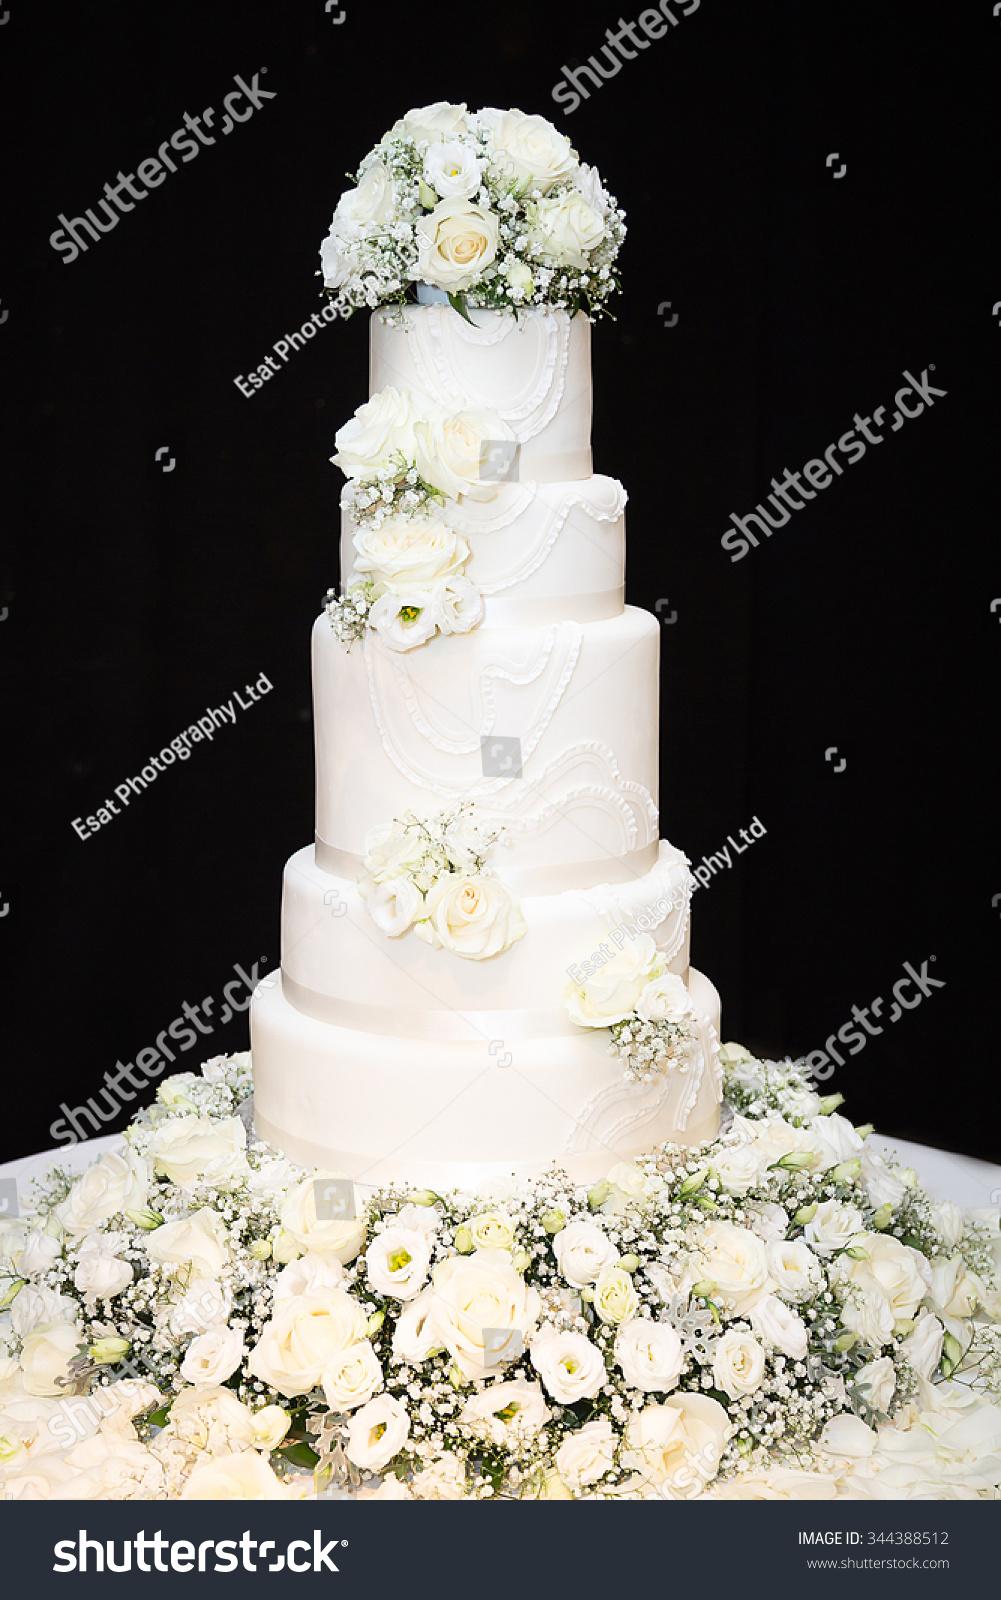 Exelent Dirt Bike Wedding Cake Gallery - The Wedding Ideas ...